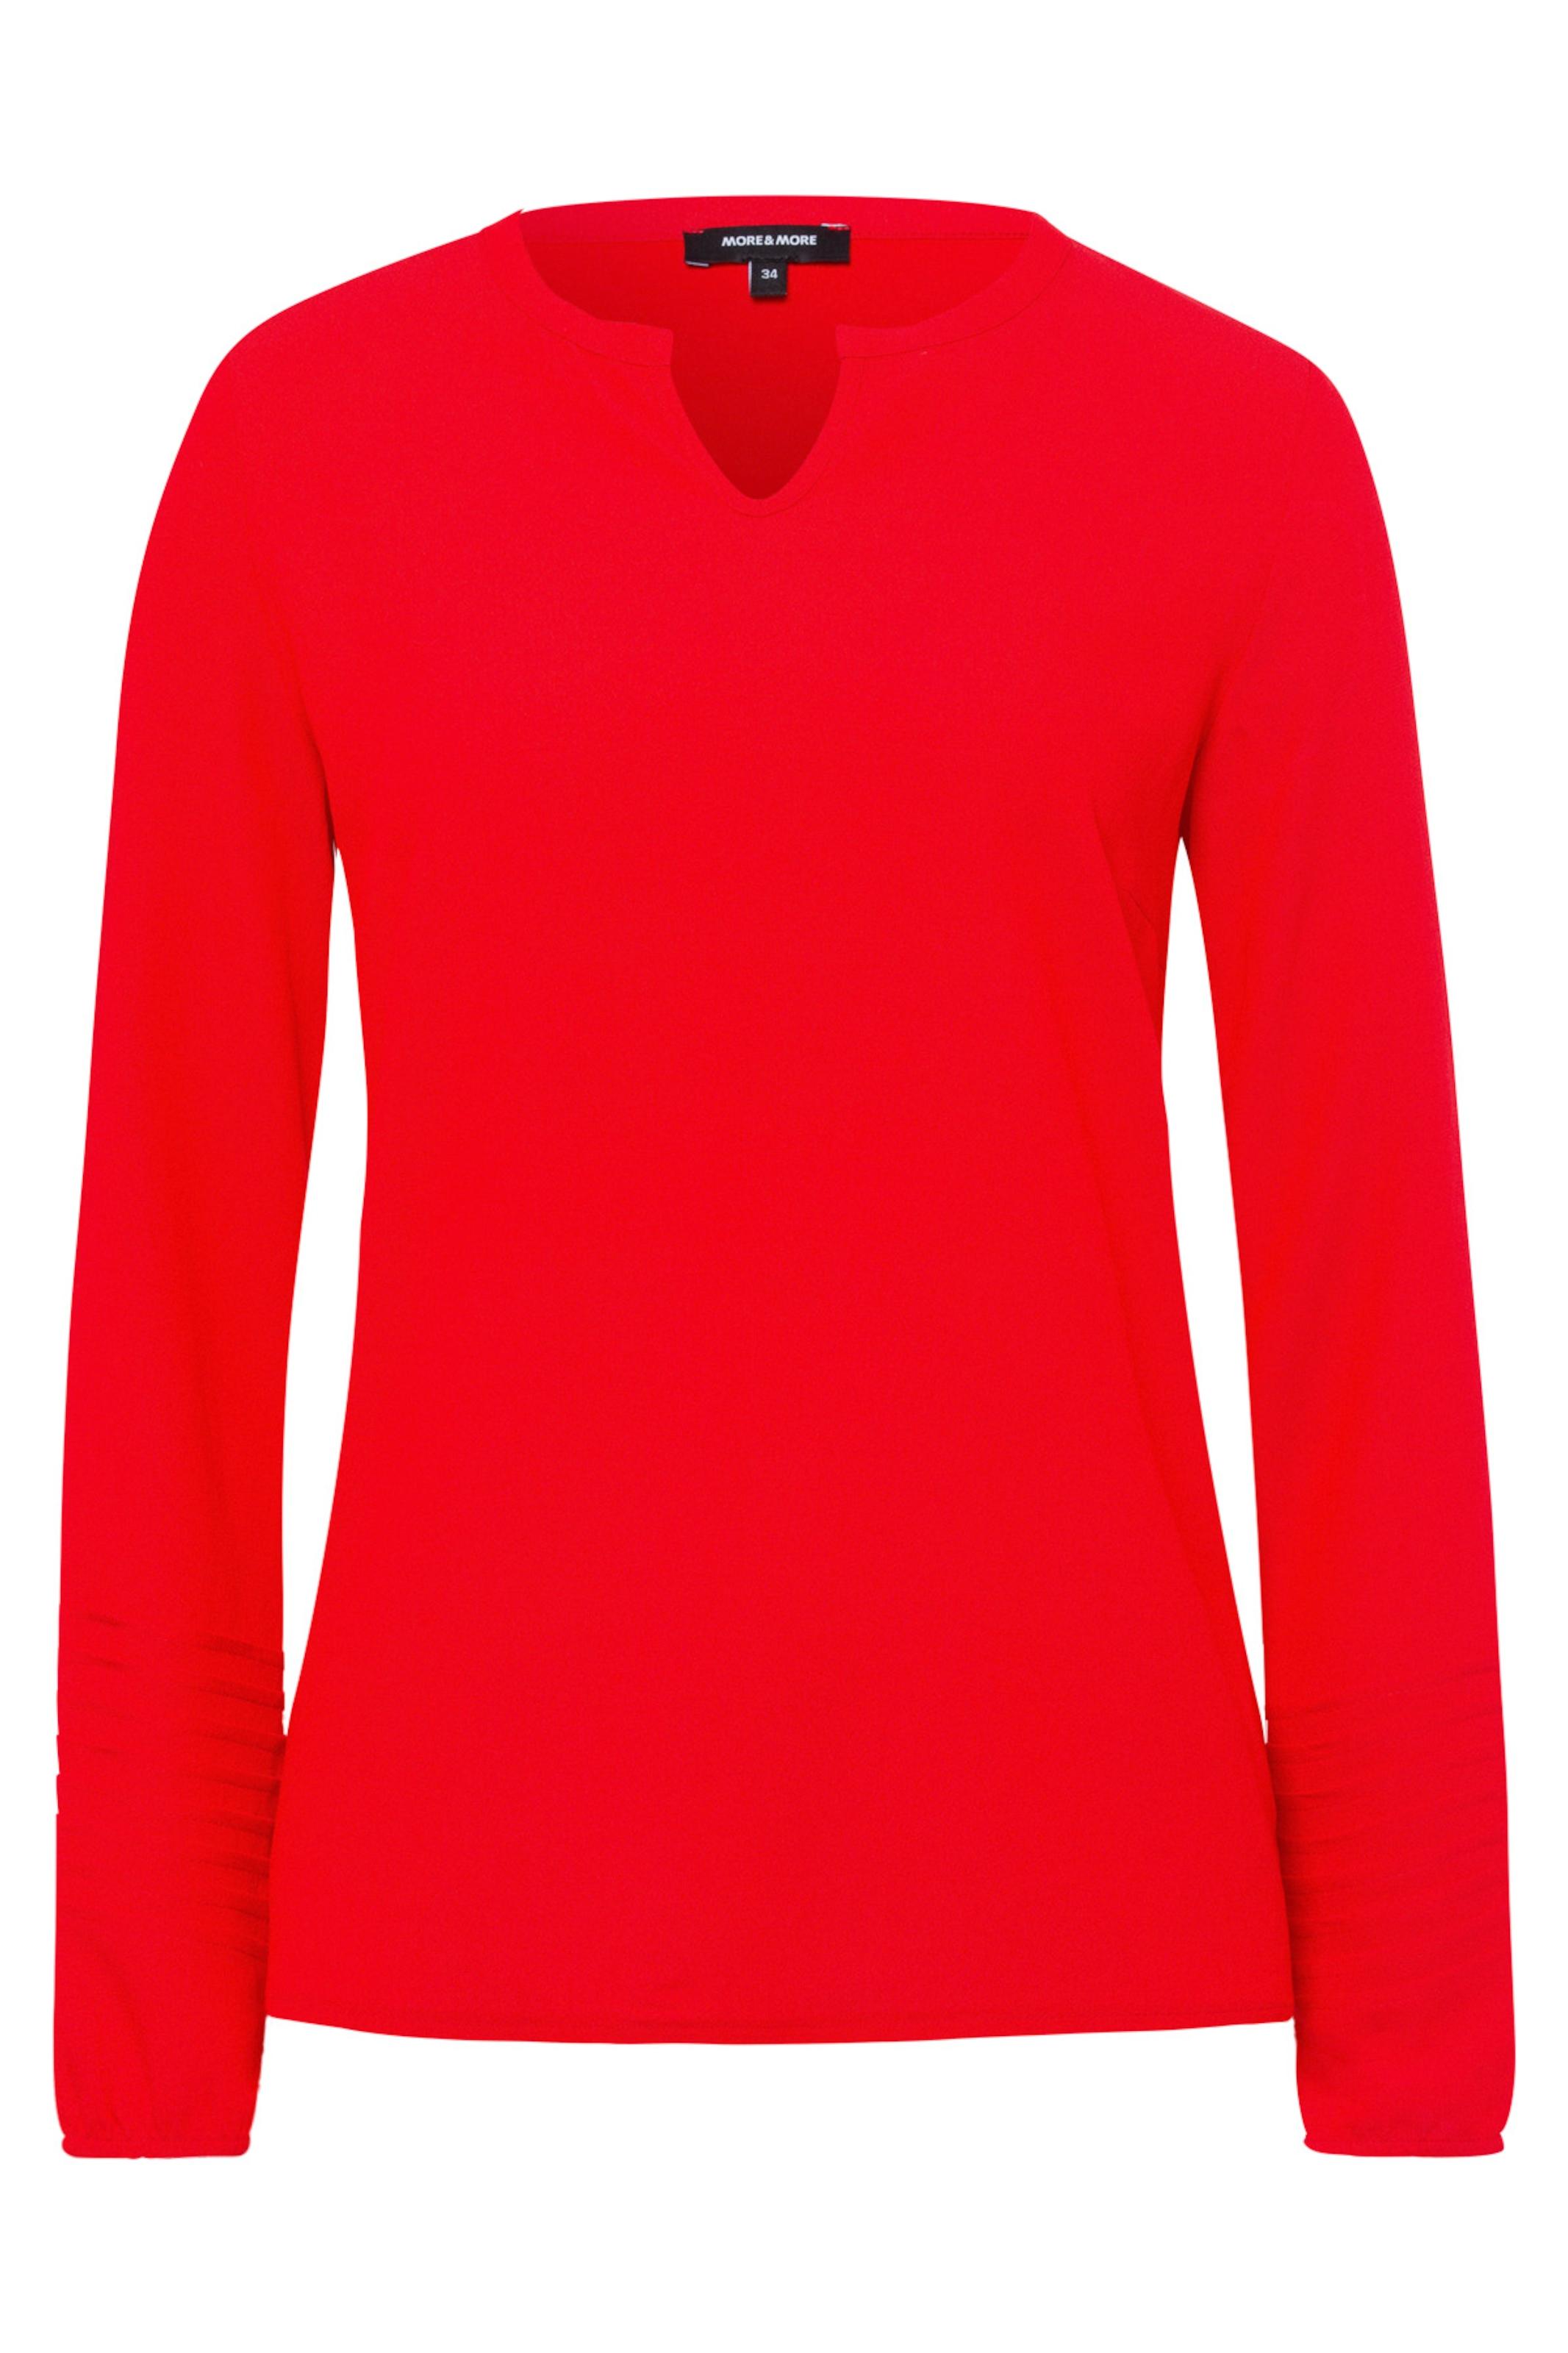 Rot Shirt Shirt In Moreamp; Rot Shirt Moreamp; In In Moreamp; In Rot Moreamp; Shirt 0kwONnP8X